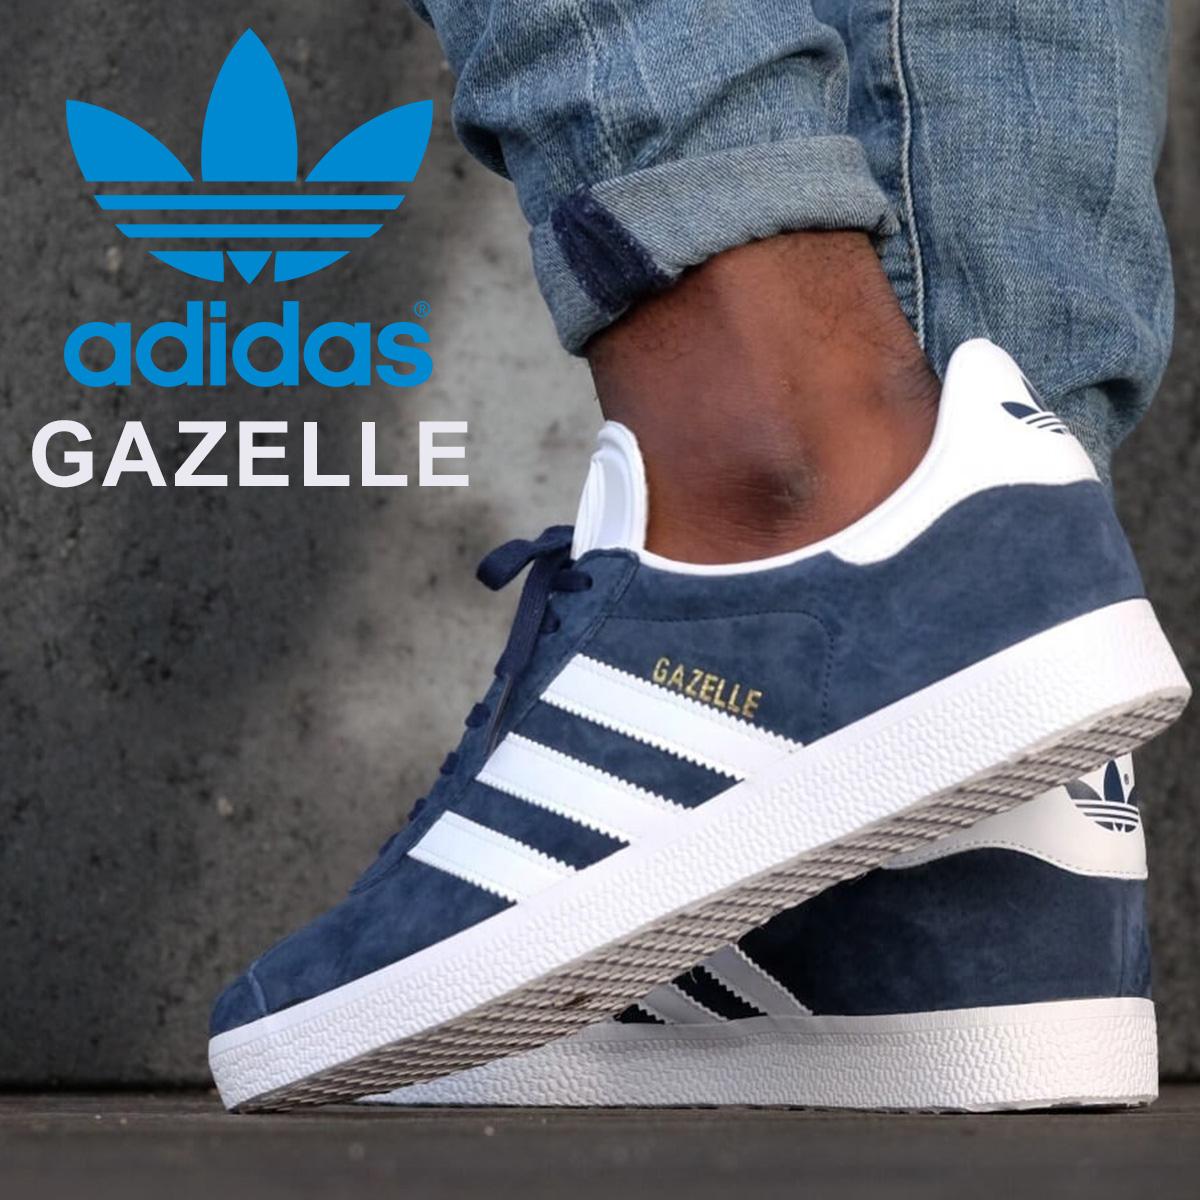 adidas gazelle navy